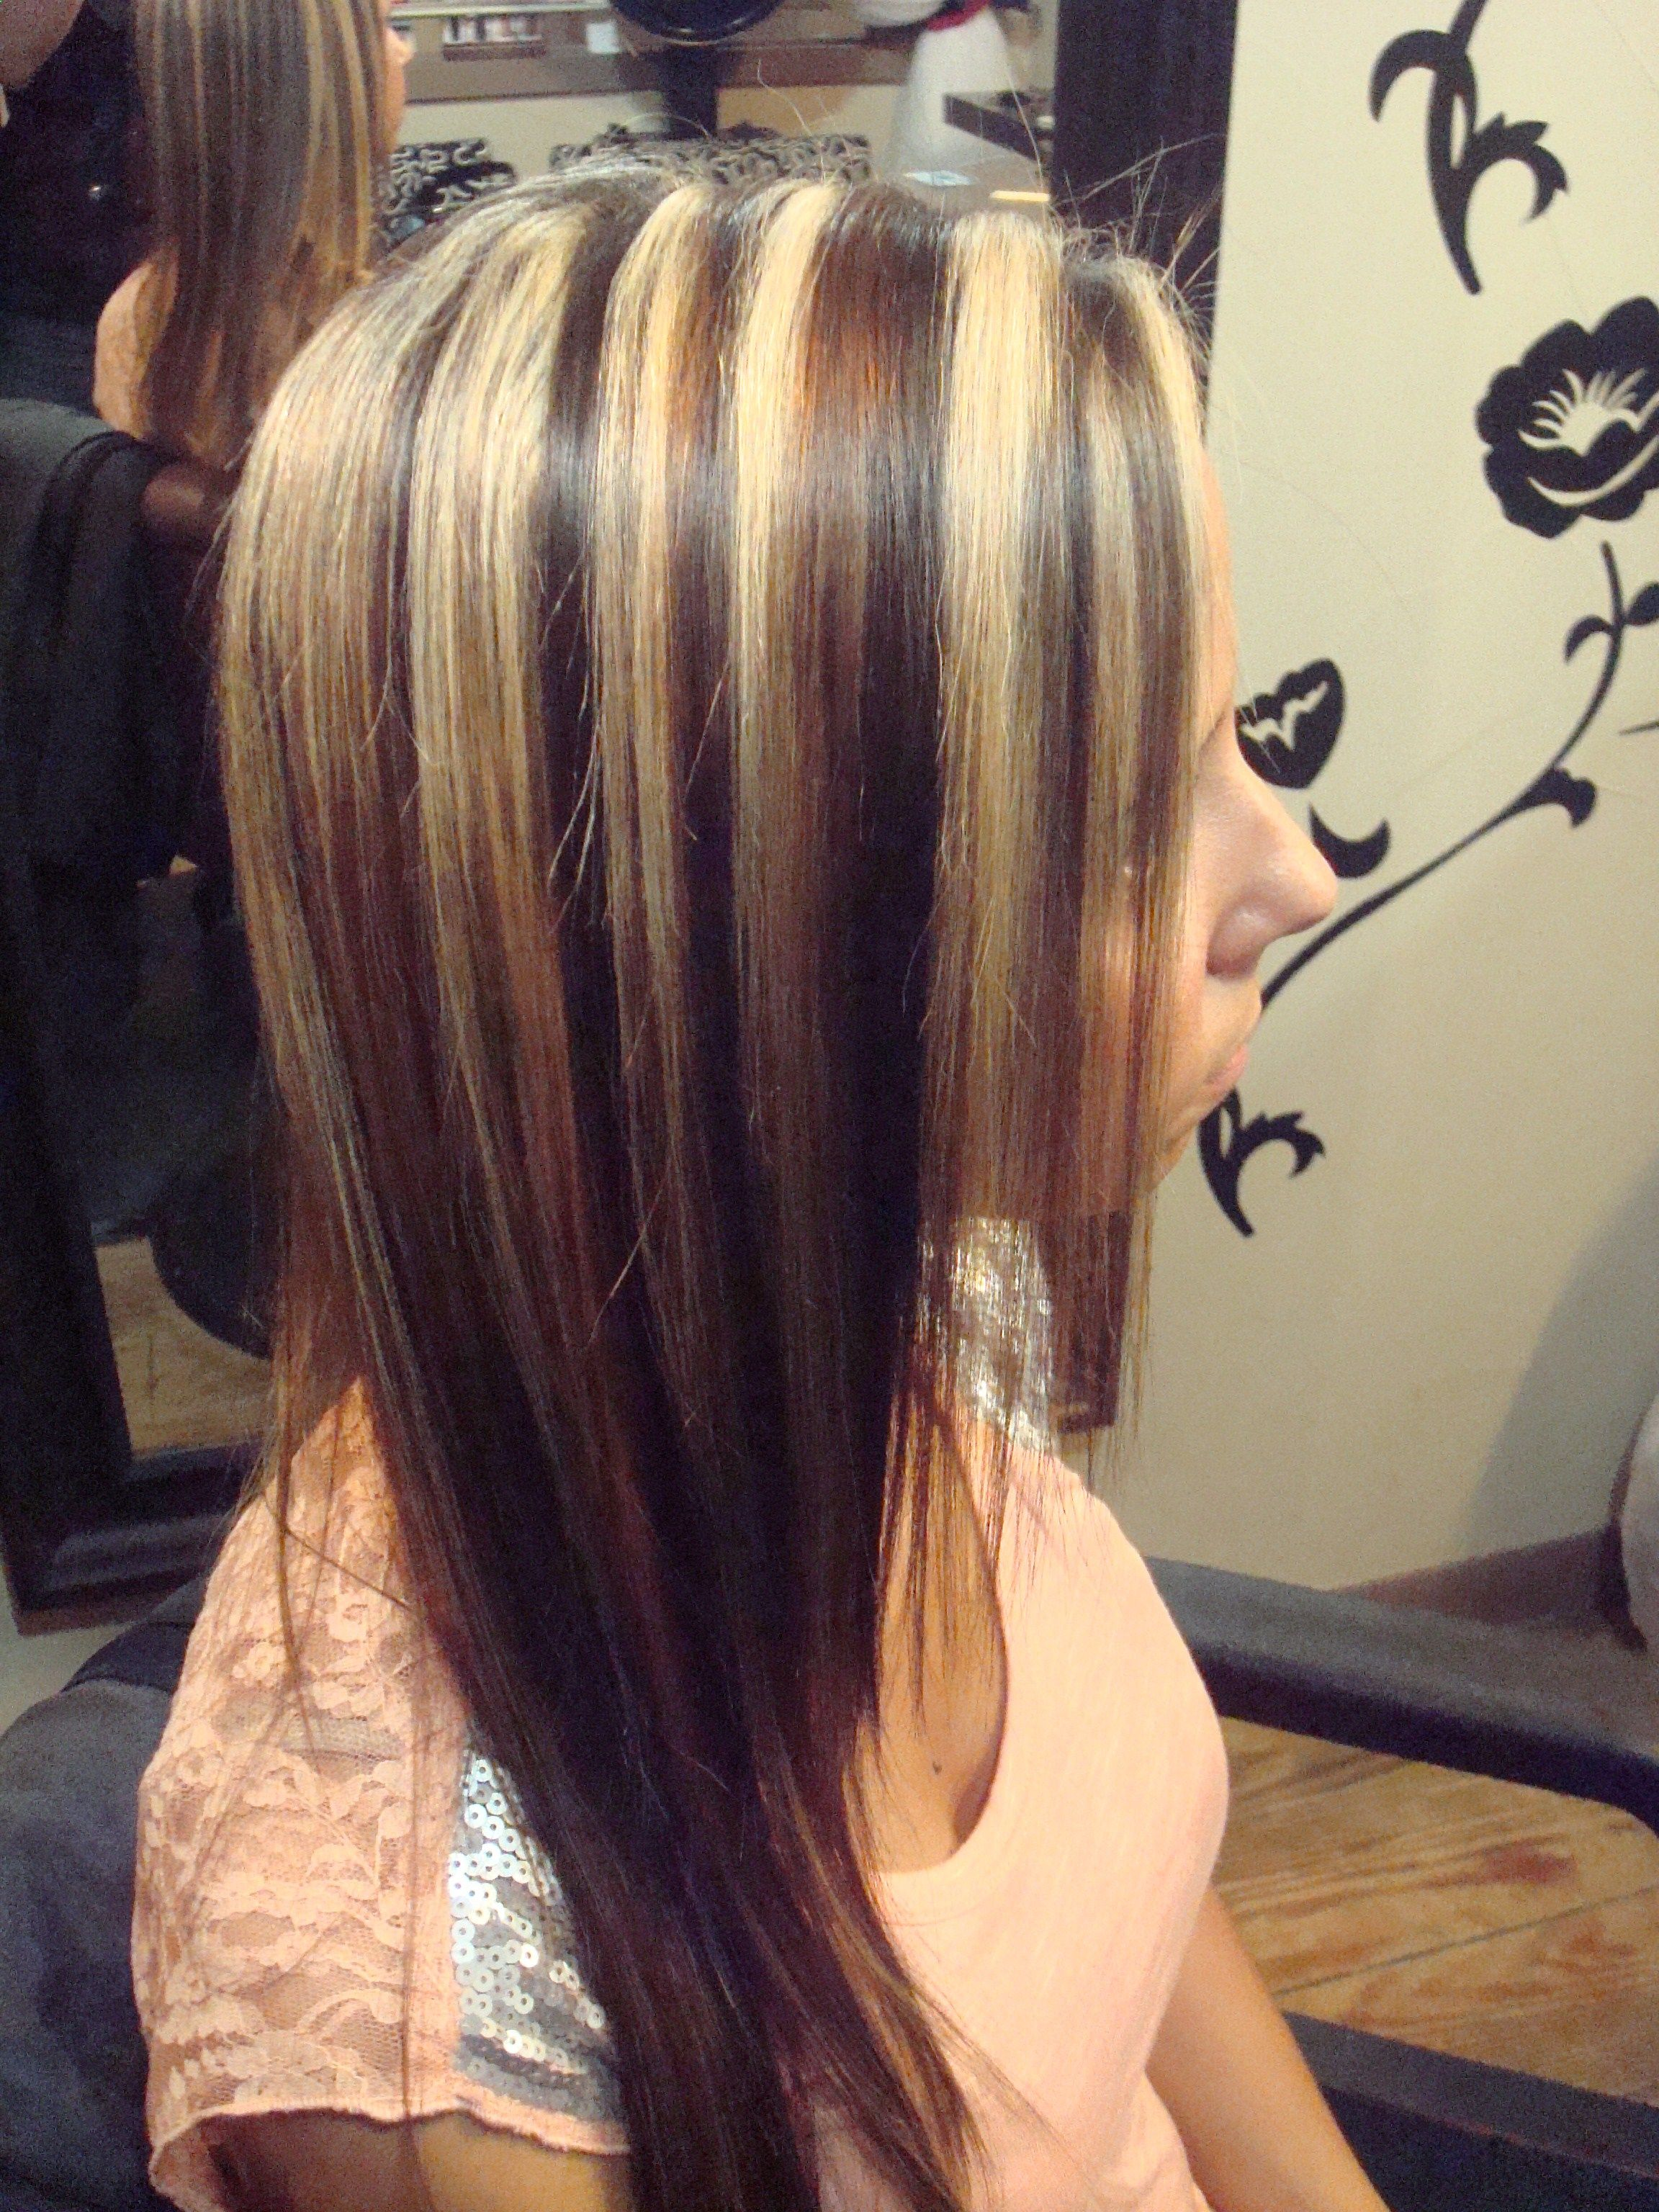 Hair Highlights For Brown Hair Brown Hair Highlights Cosmetology